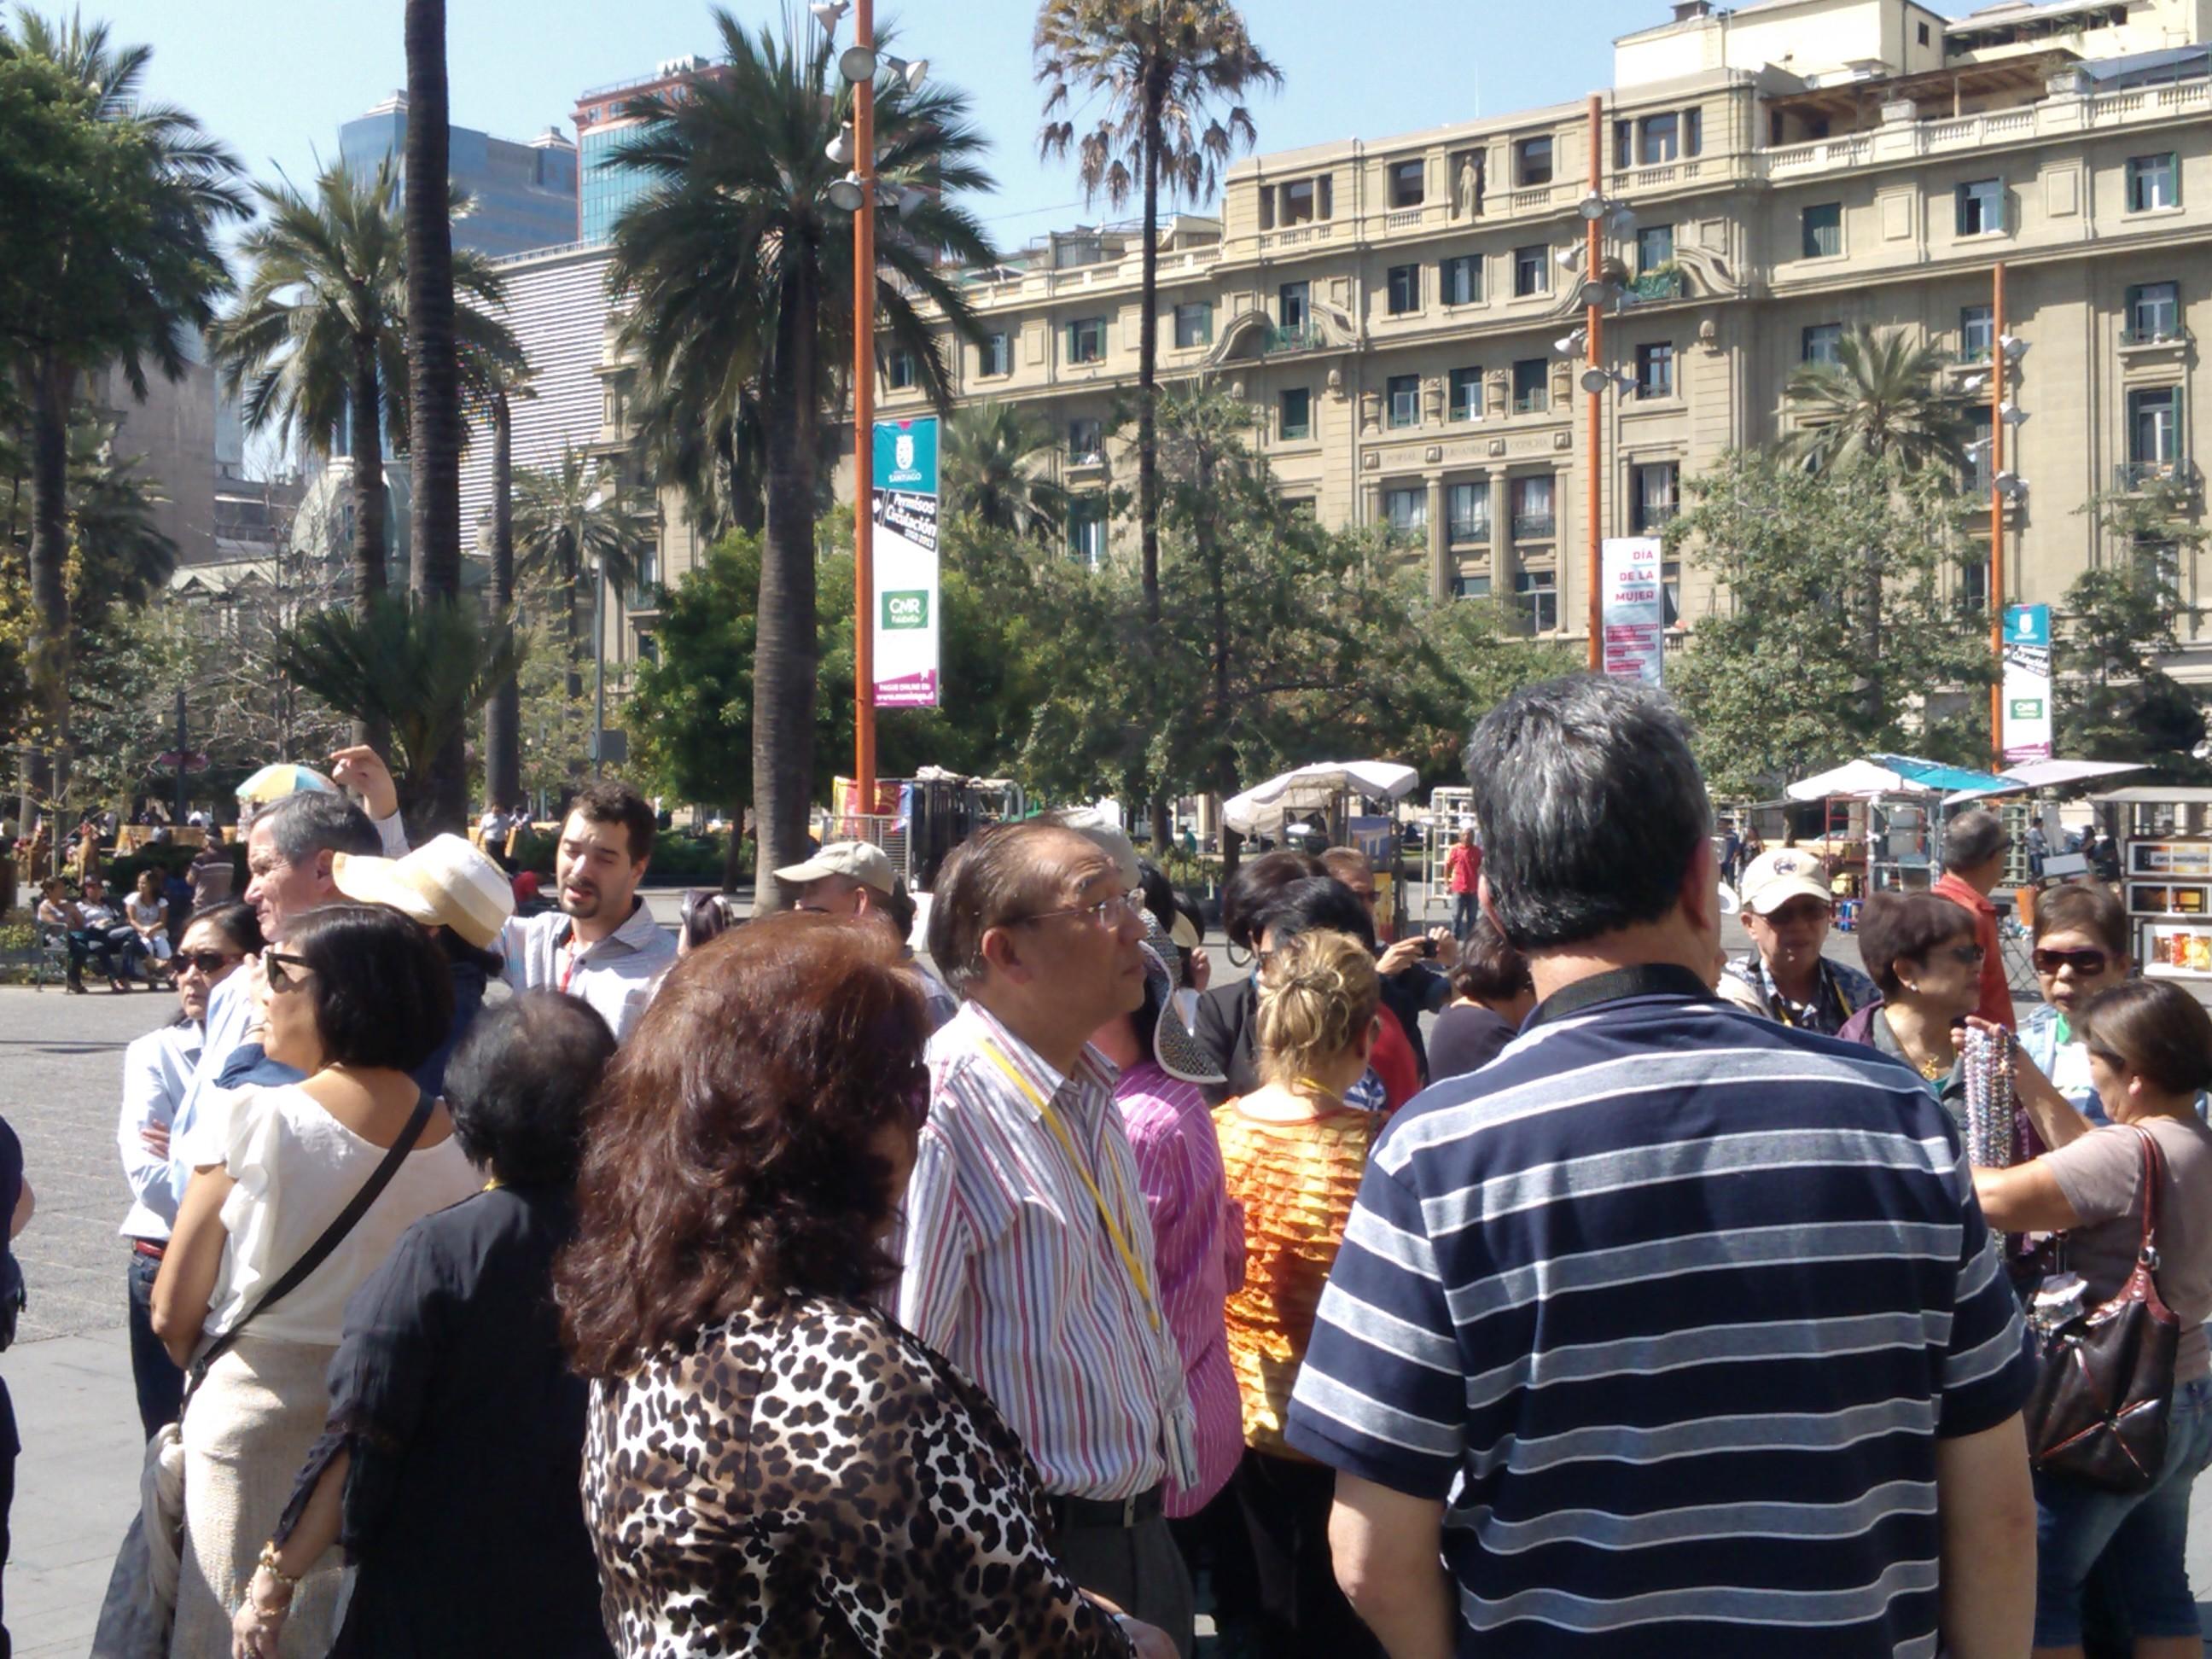 Plaza de Armas, Visiting the Main Square in Santiago Chile